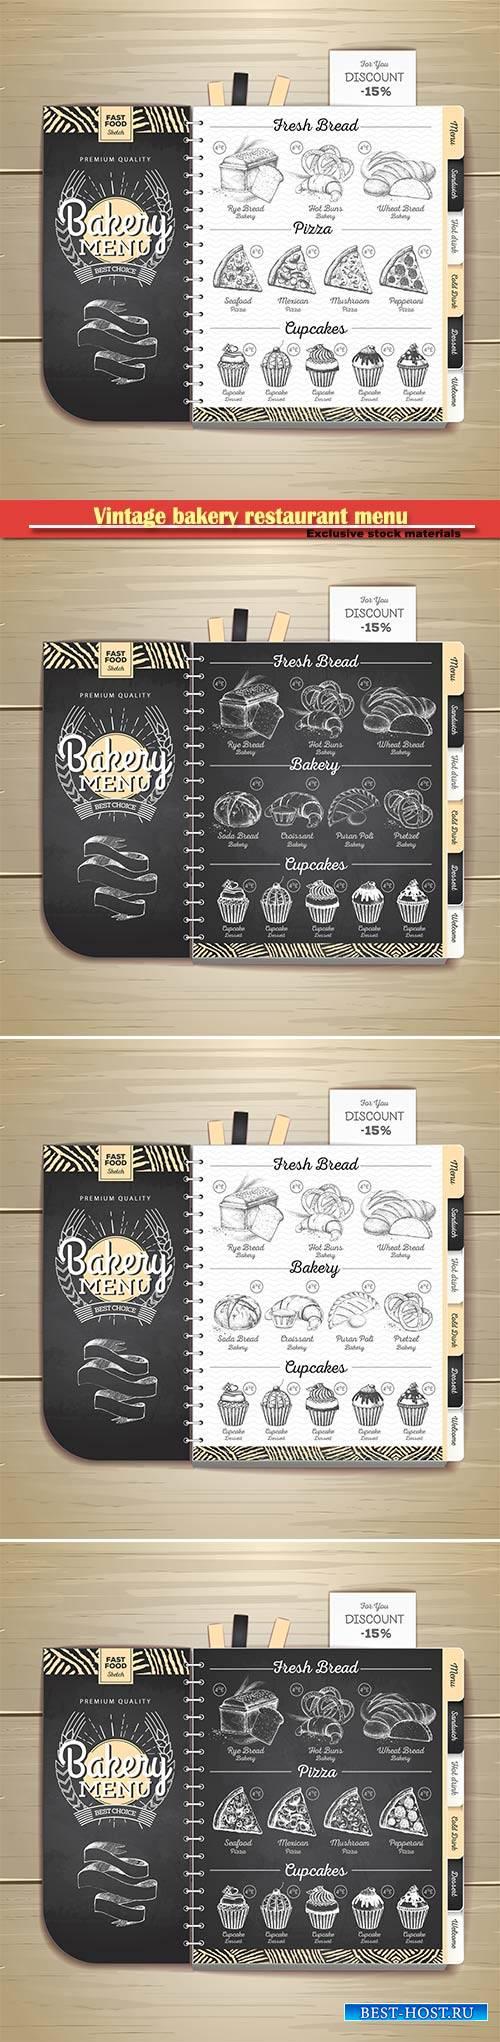 Vintage chalk drawing bakery restaurant menu design  vector illustration